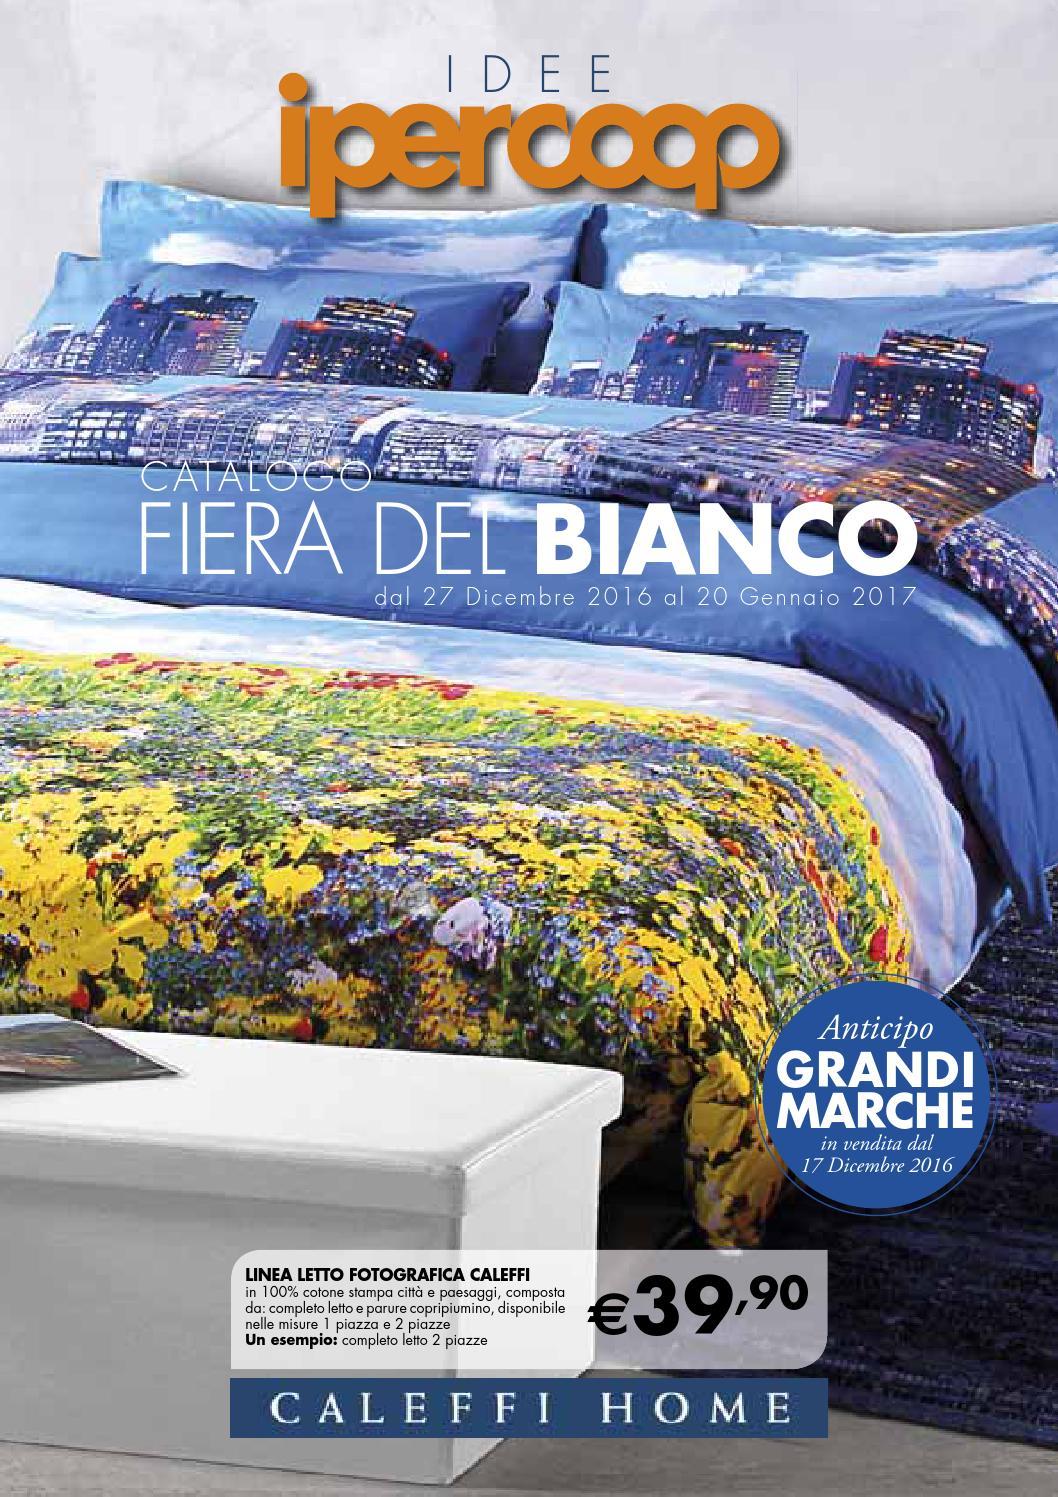 Brandina Pieghevole Offerte Roma.Ipercoop Centro Sud 40 2 By E Offerte Com Issuu